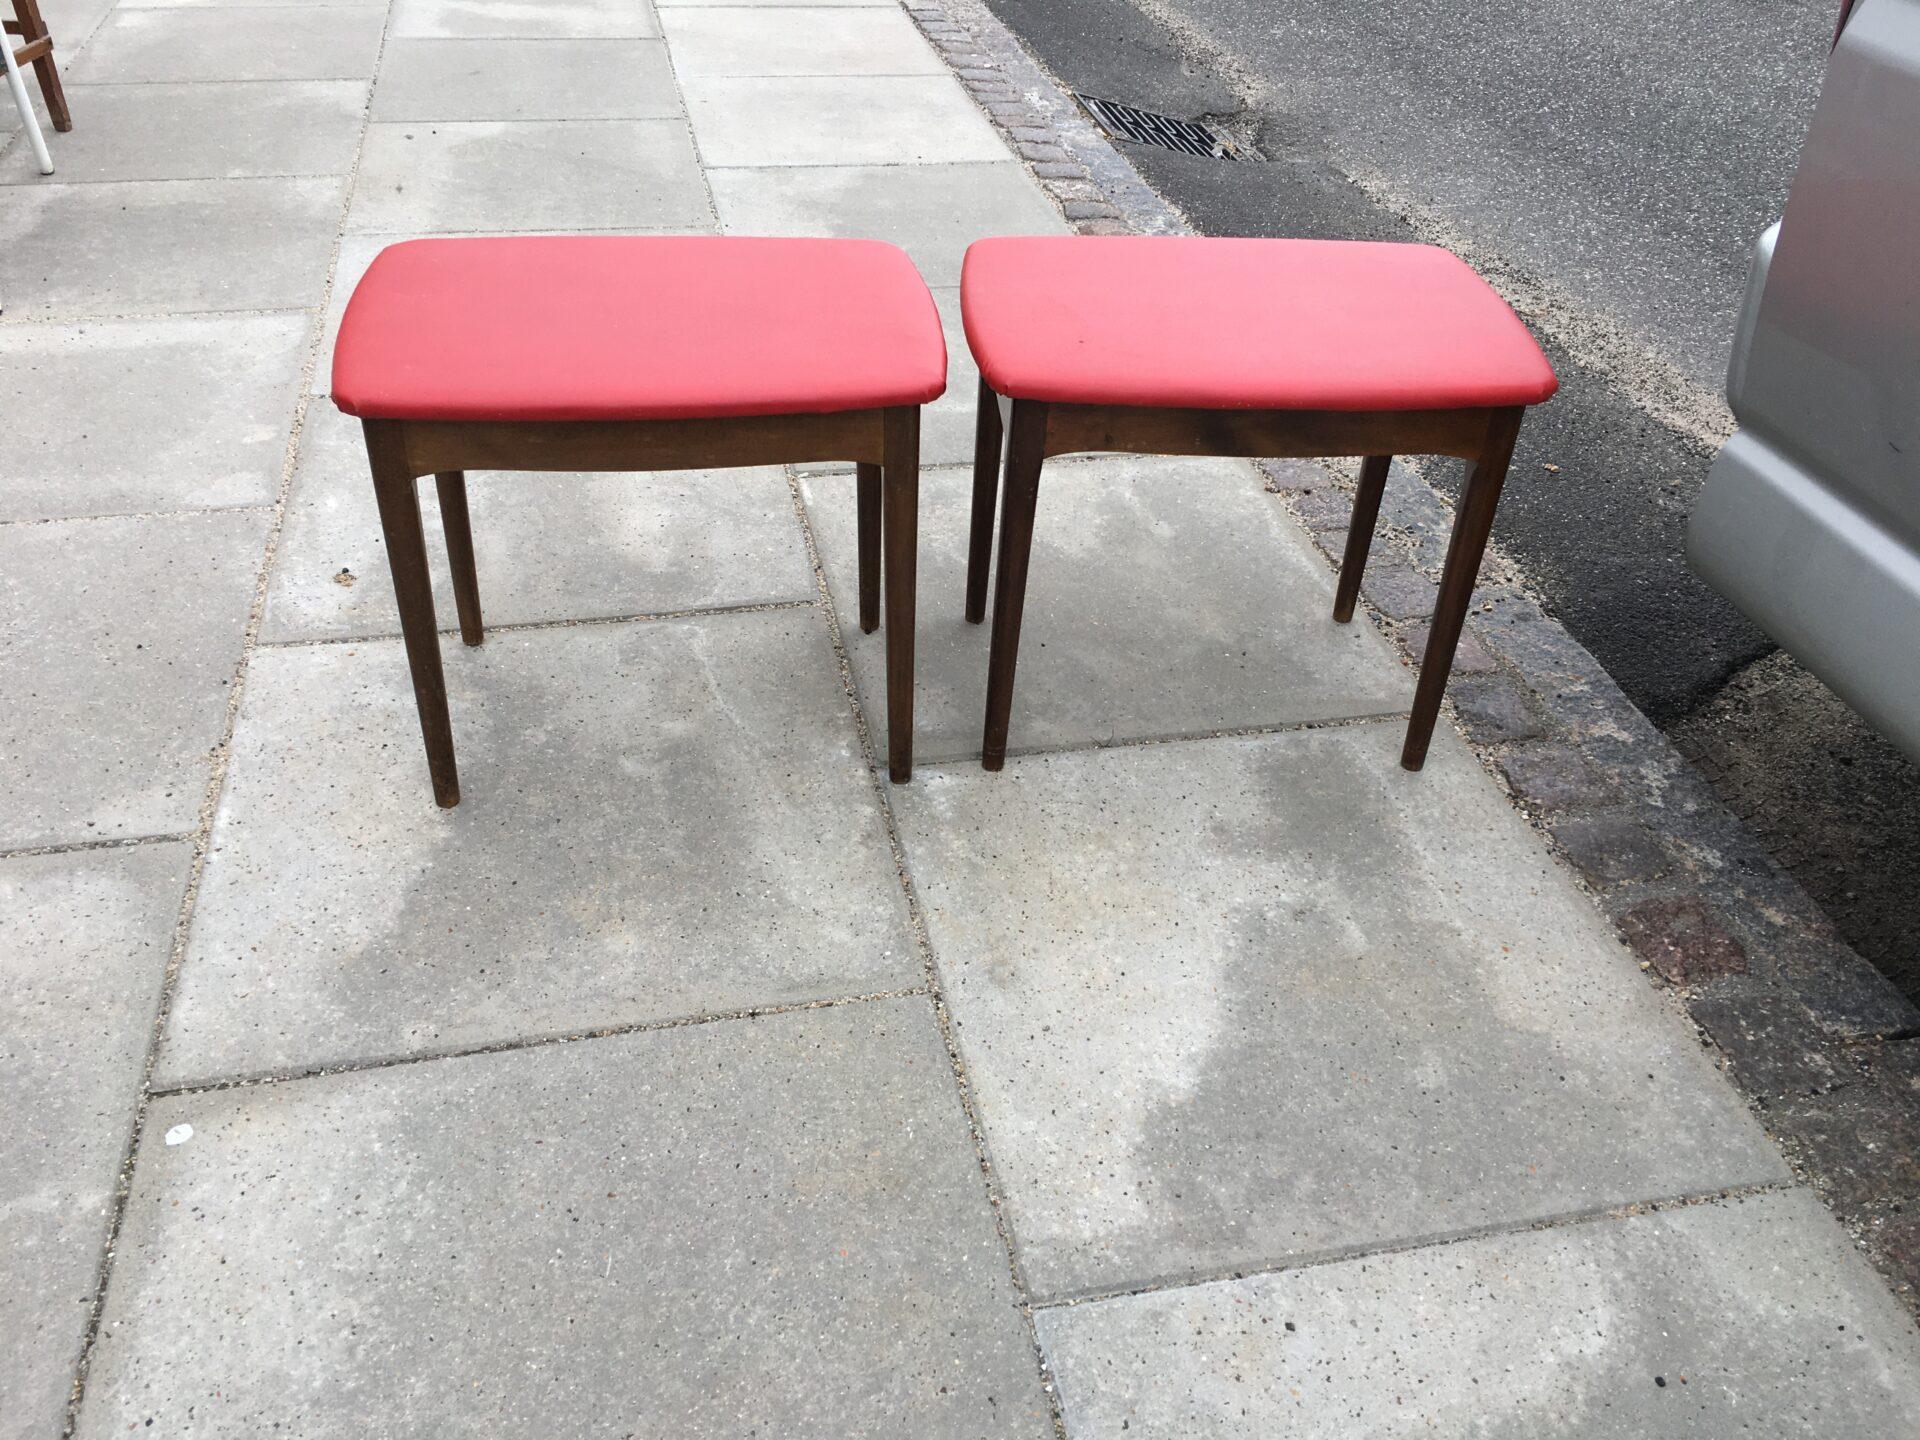 2 stk retro puffer/taburetter, betrukket med rødt kunstlæder, pr stk 250 kr